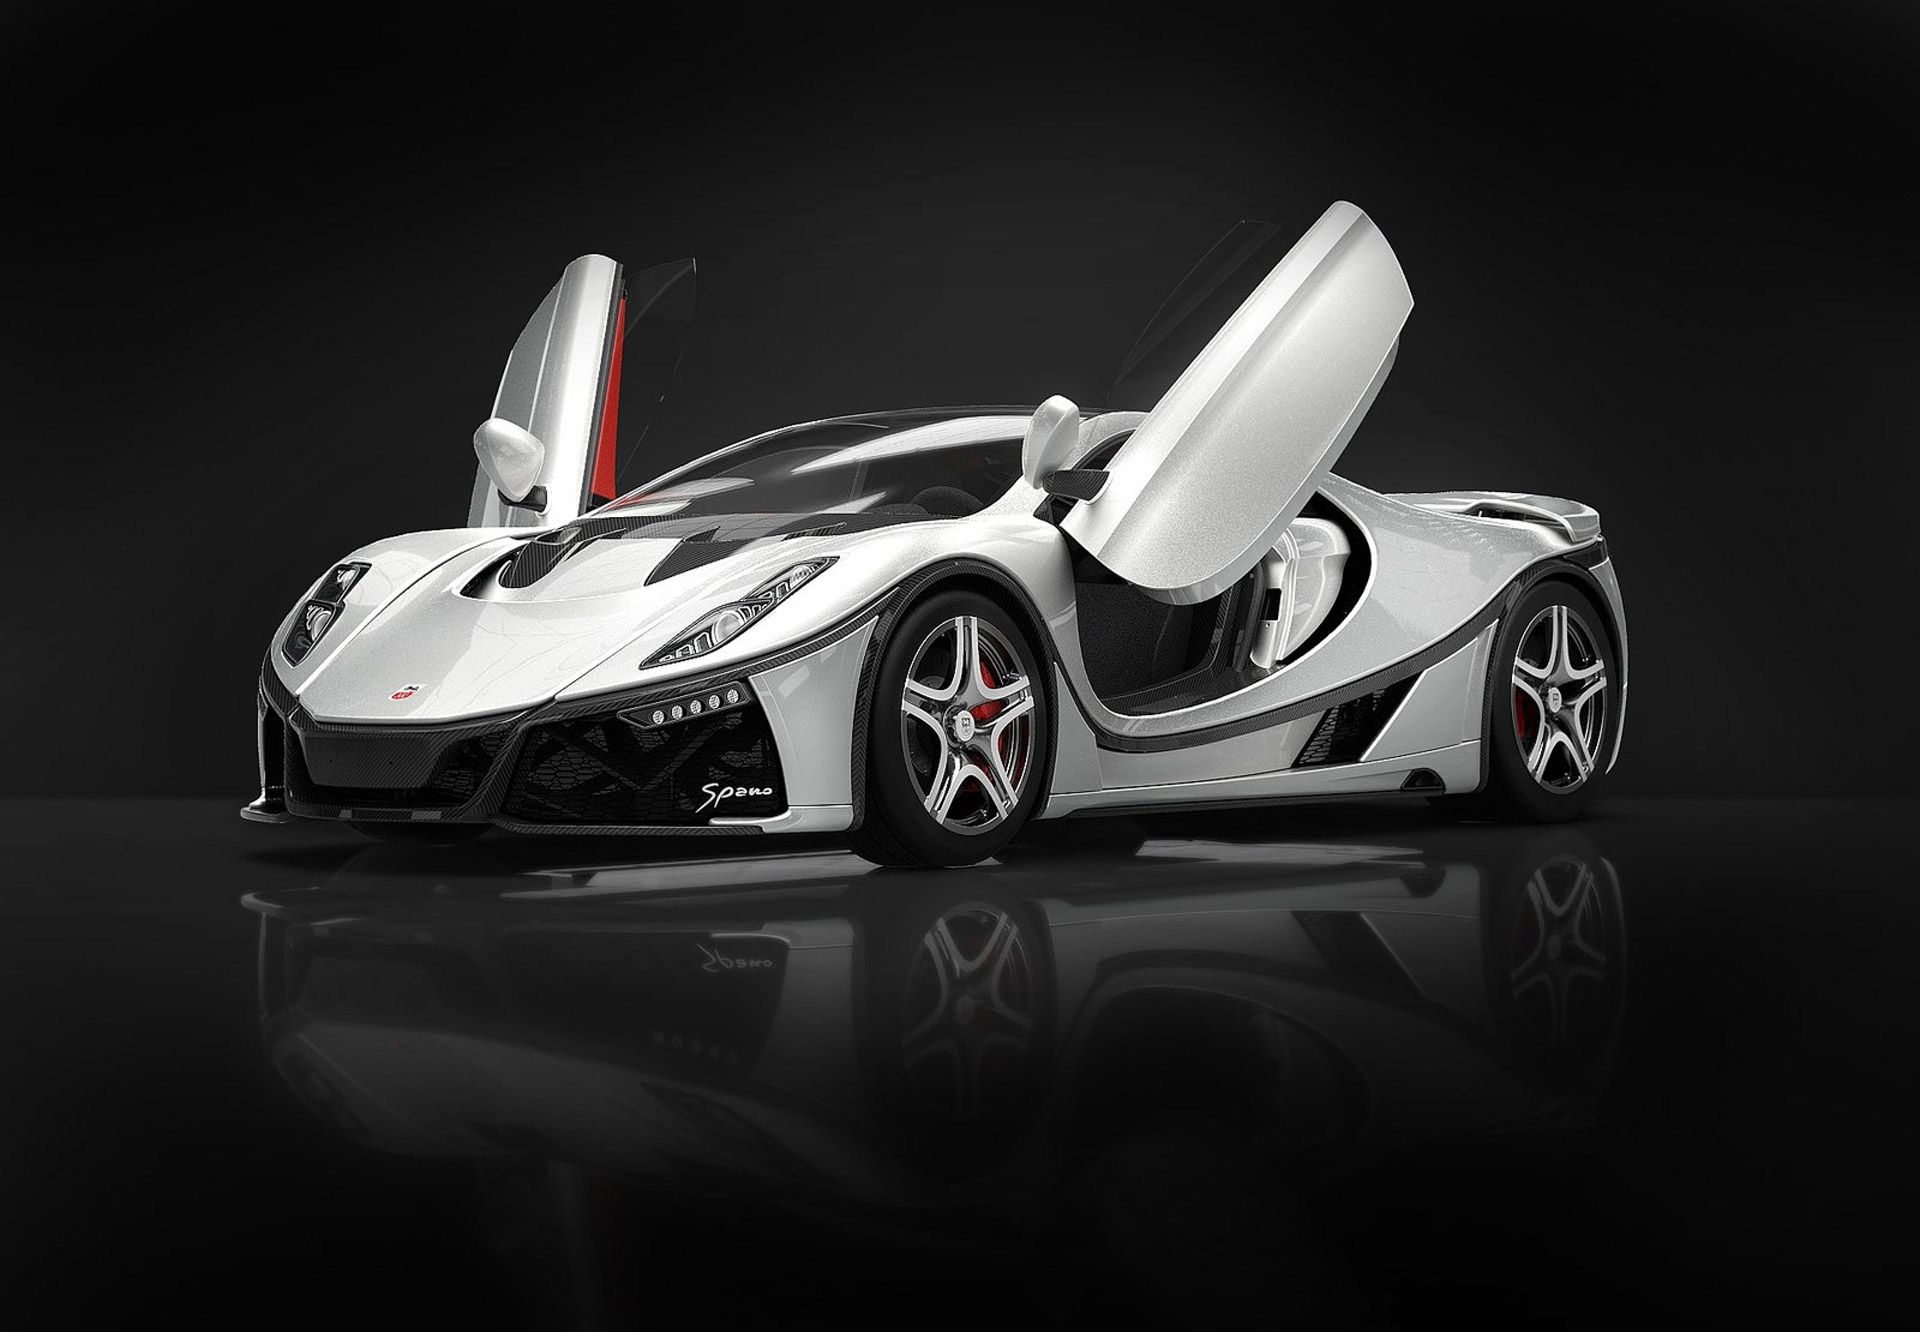 Spain S Gta Reveals New Version Of Spano V 10 Supercar At 2015 Geneva Motor Show Super Cars Geneva Motor Show Gta